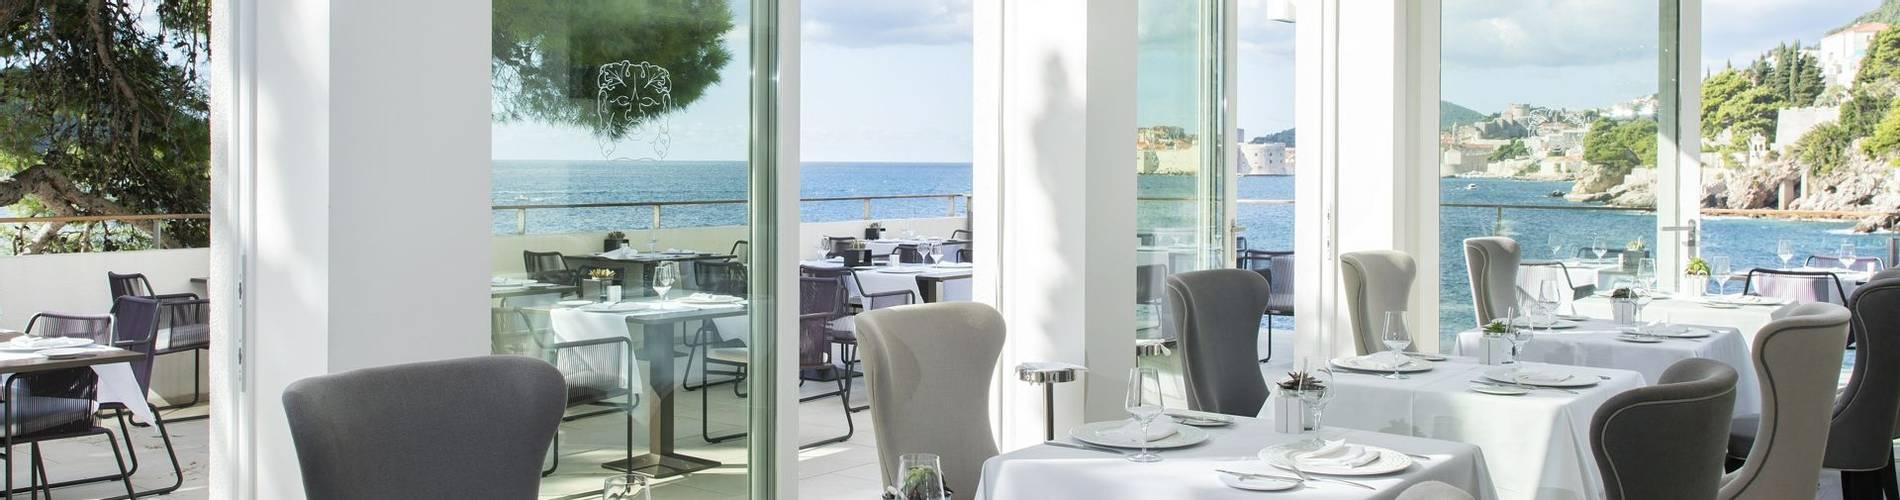 Spectacular seaview from the dining room at Hotel Villa Dubrovnik.jpg